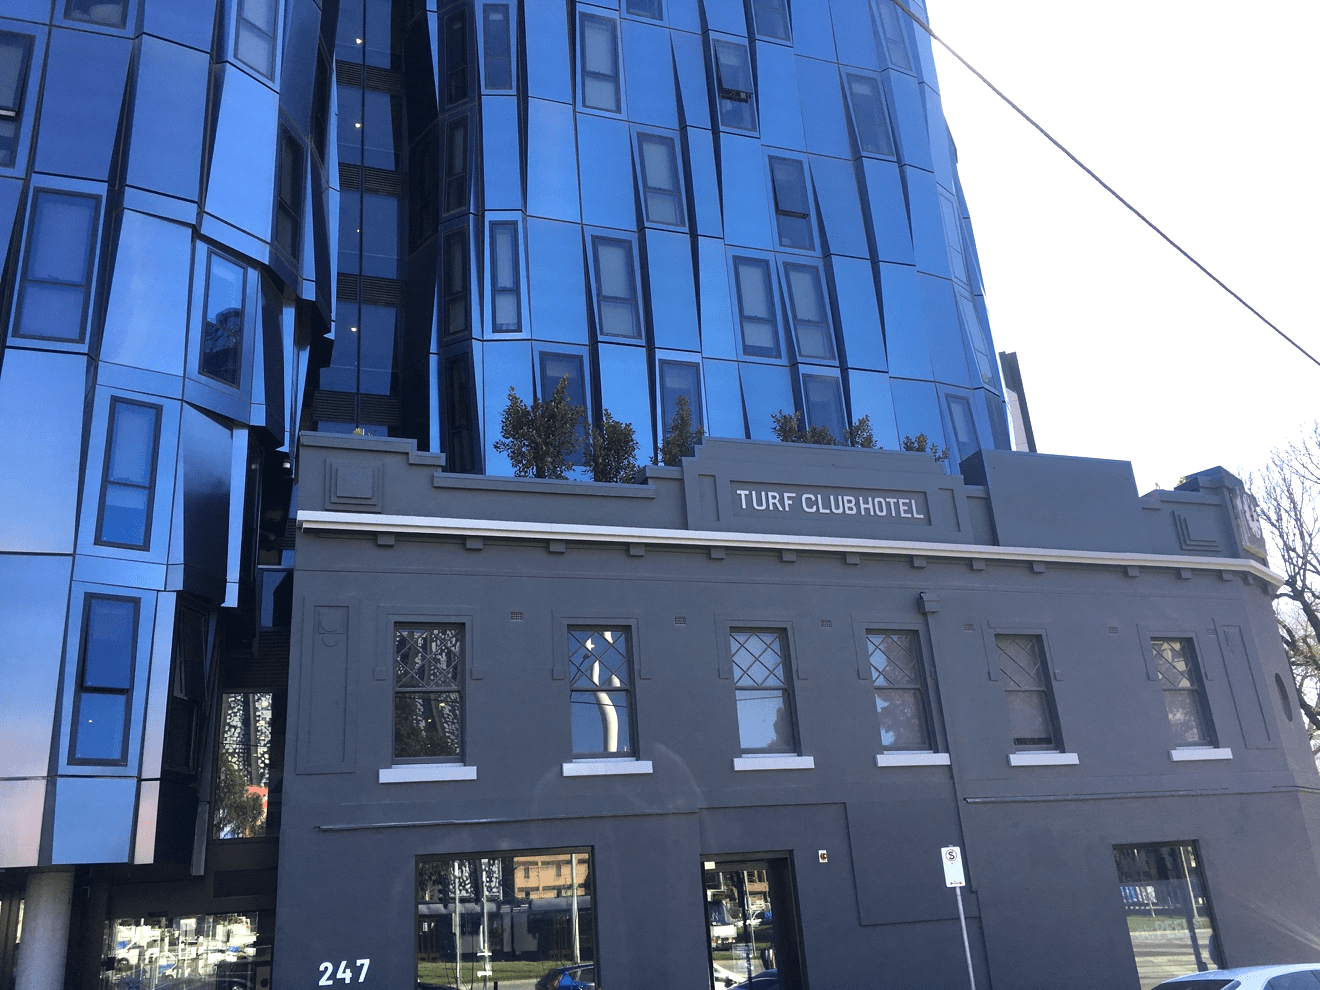 Turf Club Hotel façade, North Melbourne – Photo by Julia Frecker